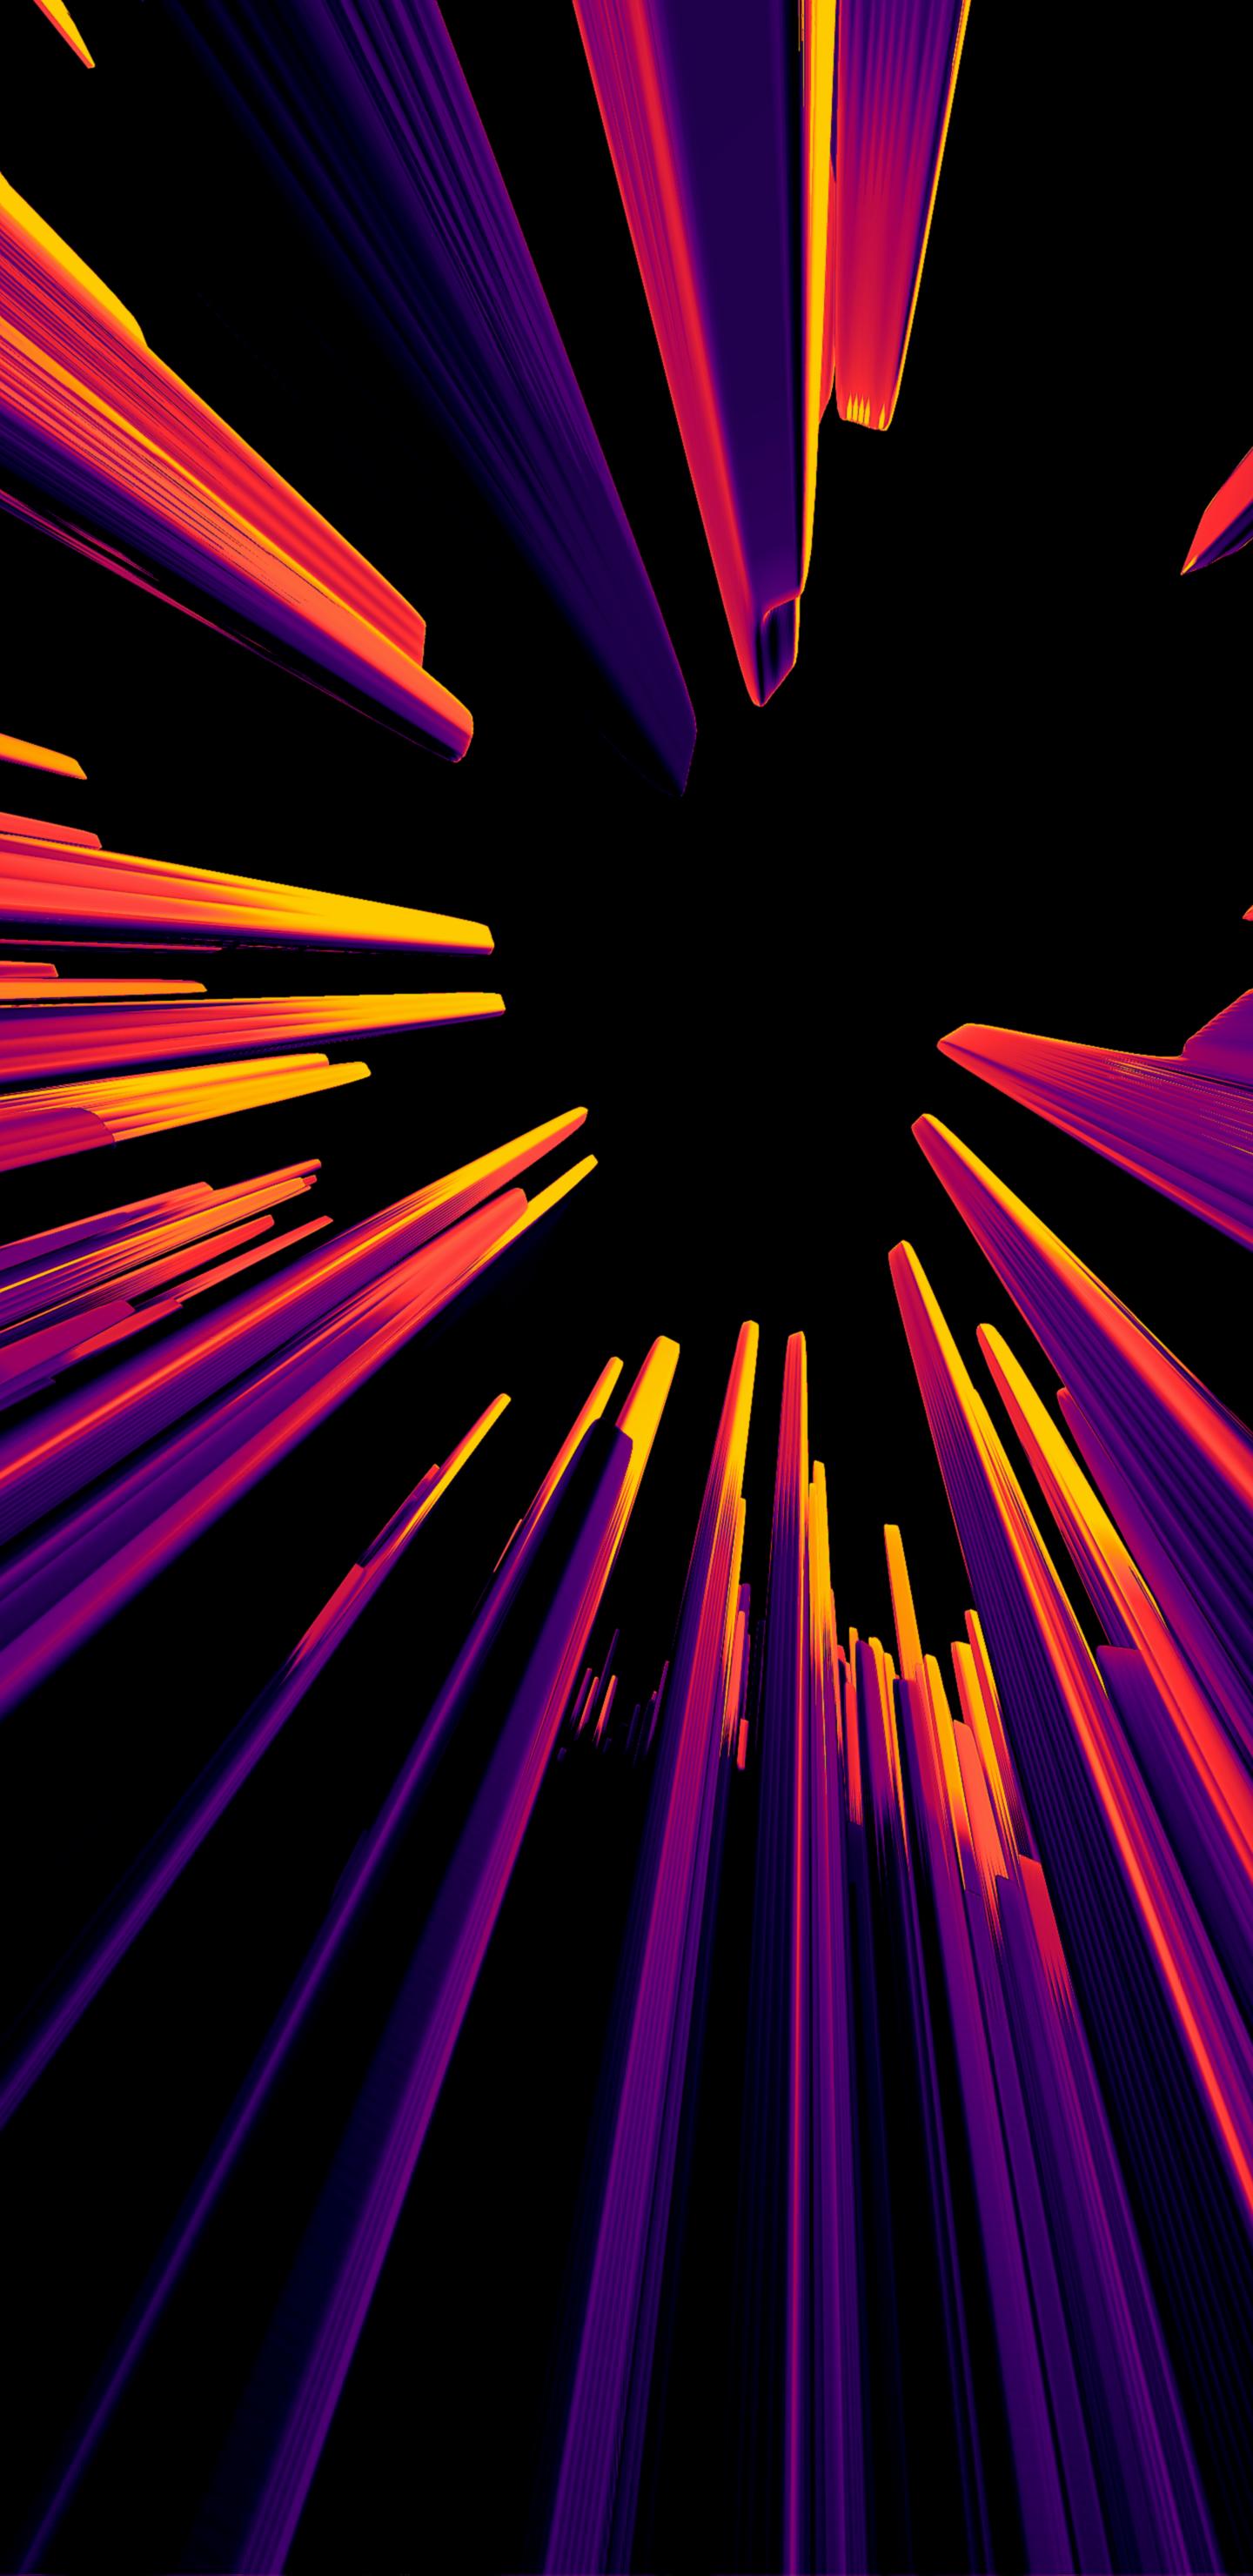 Lightspeed [1440x2960] Ios wallpapers